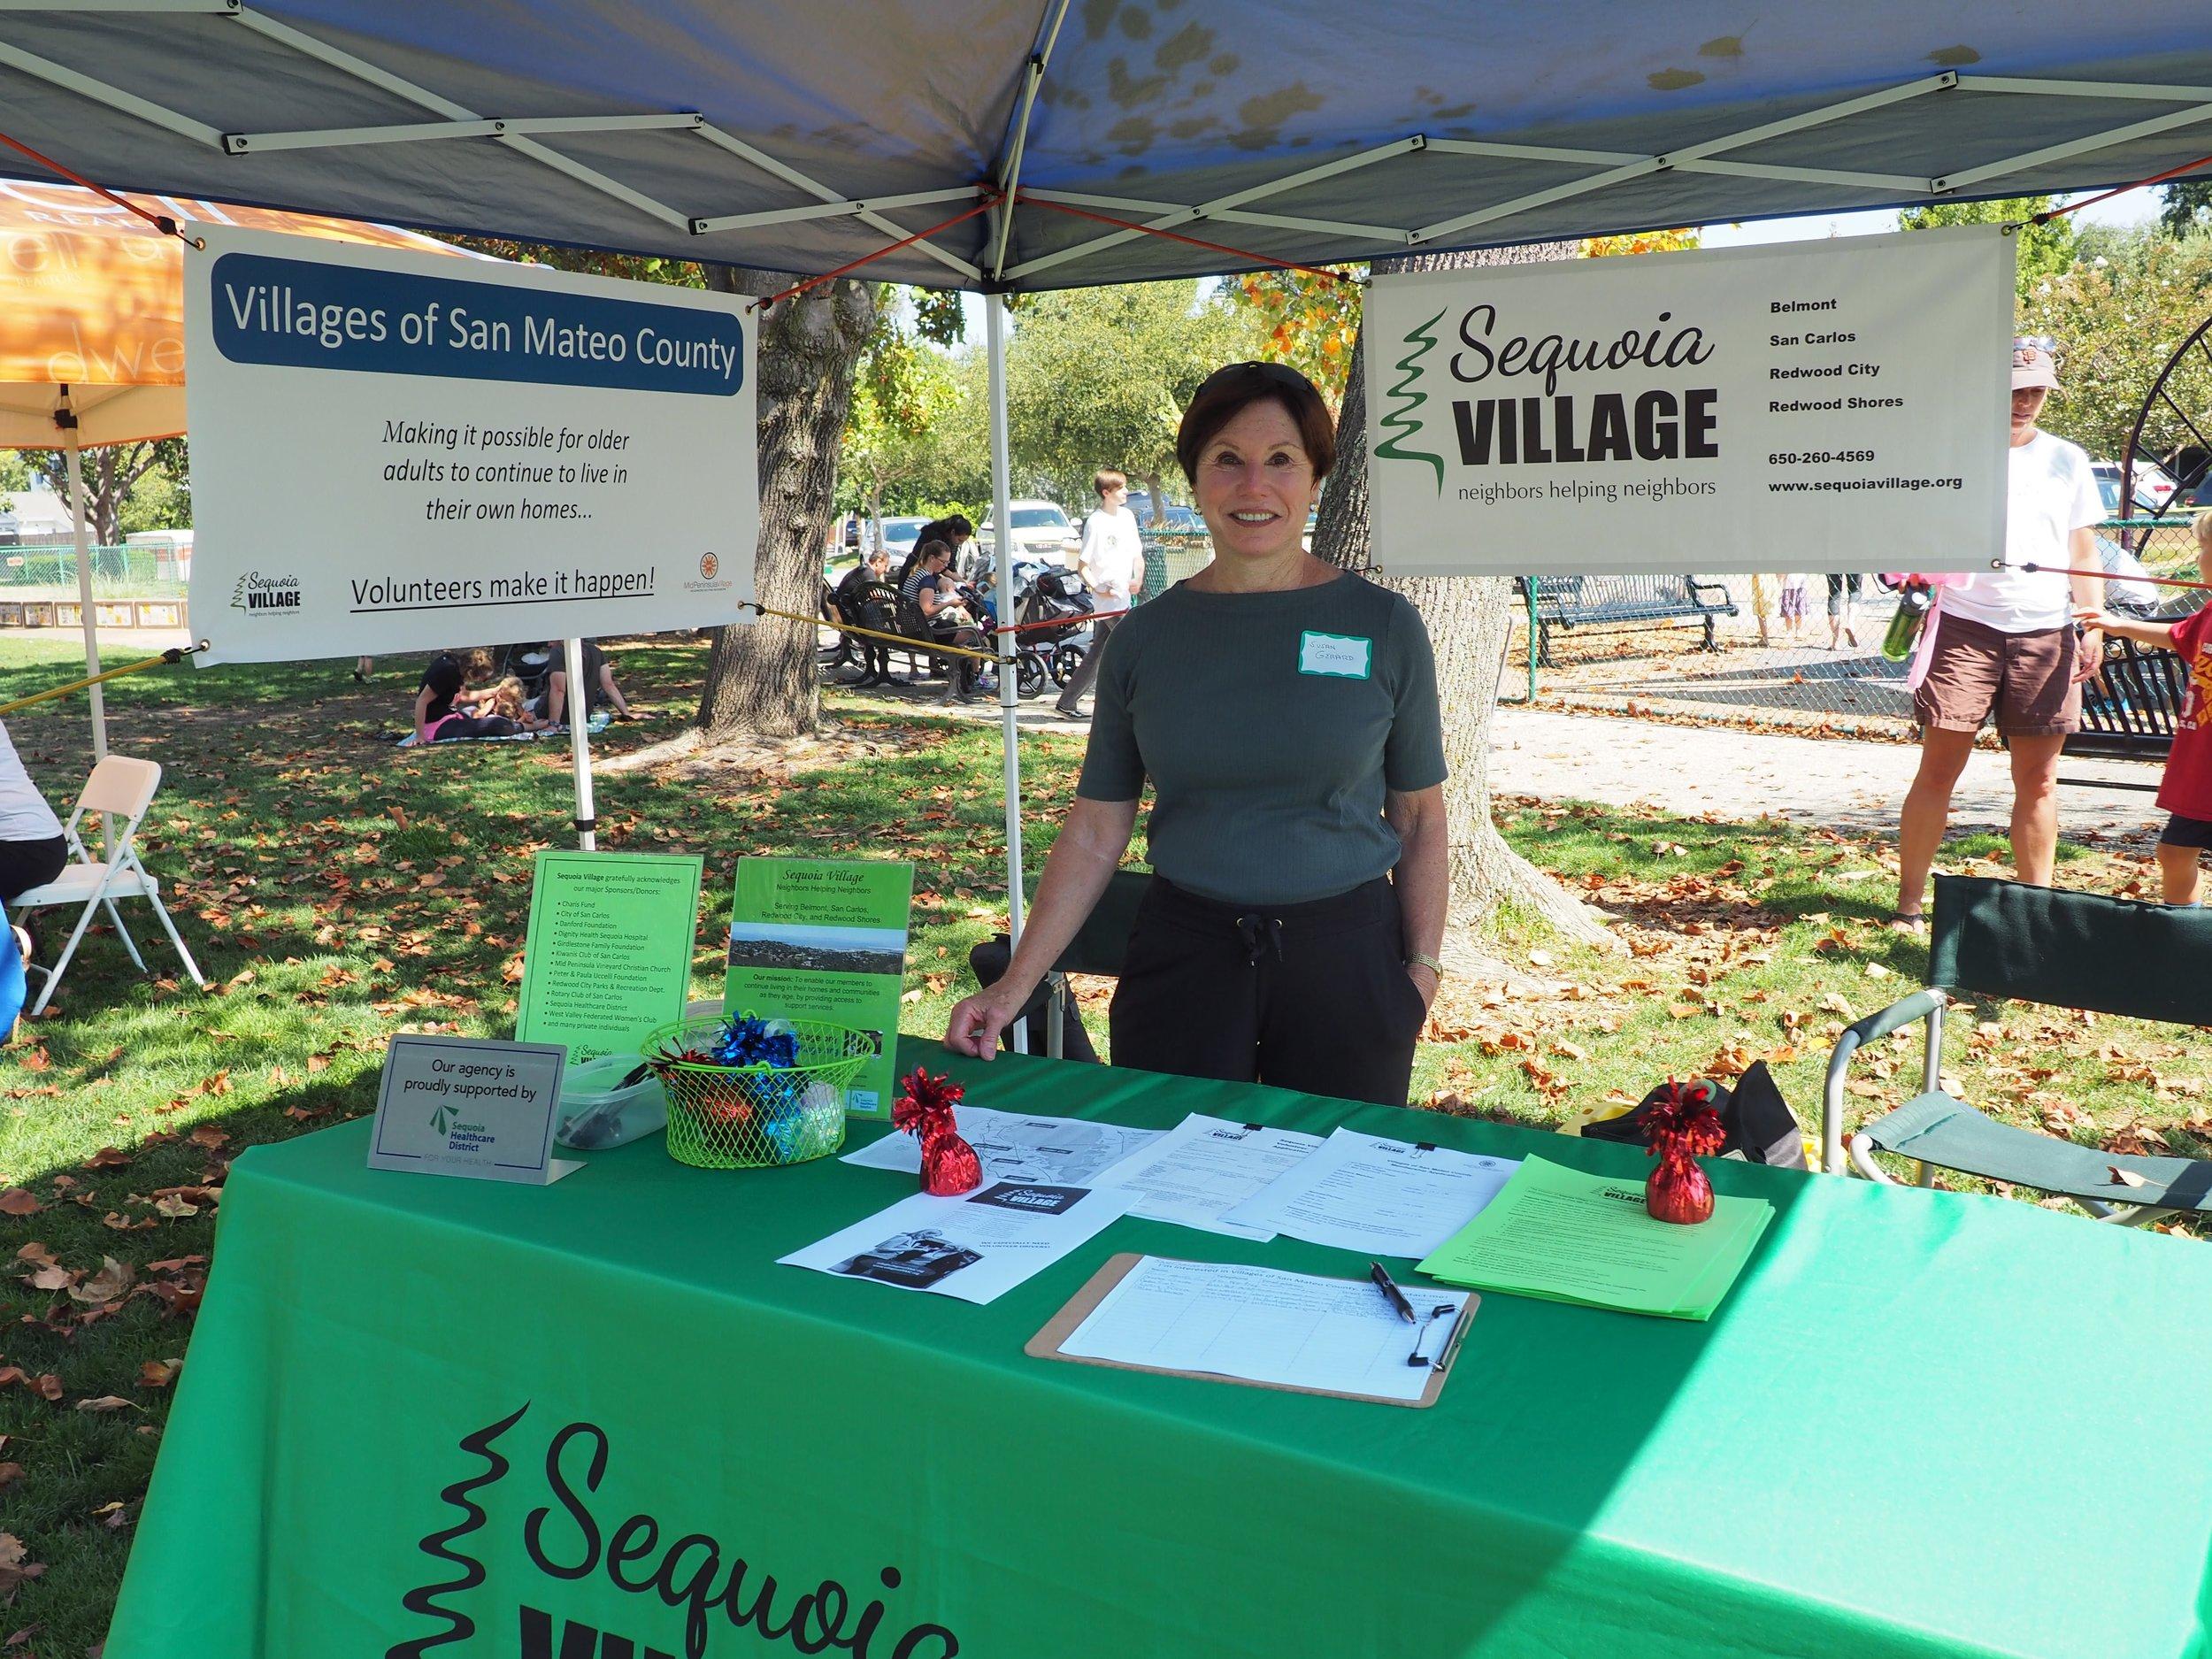 Susan from Sequoia Village!